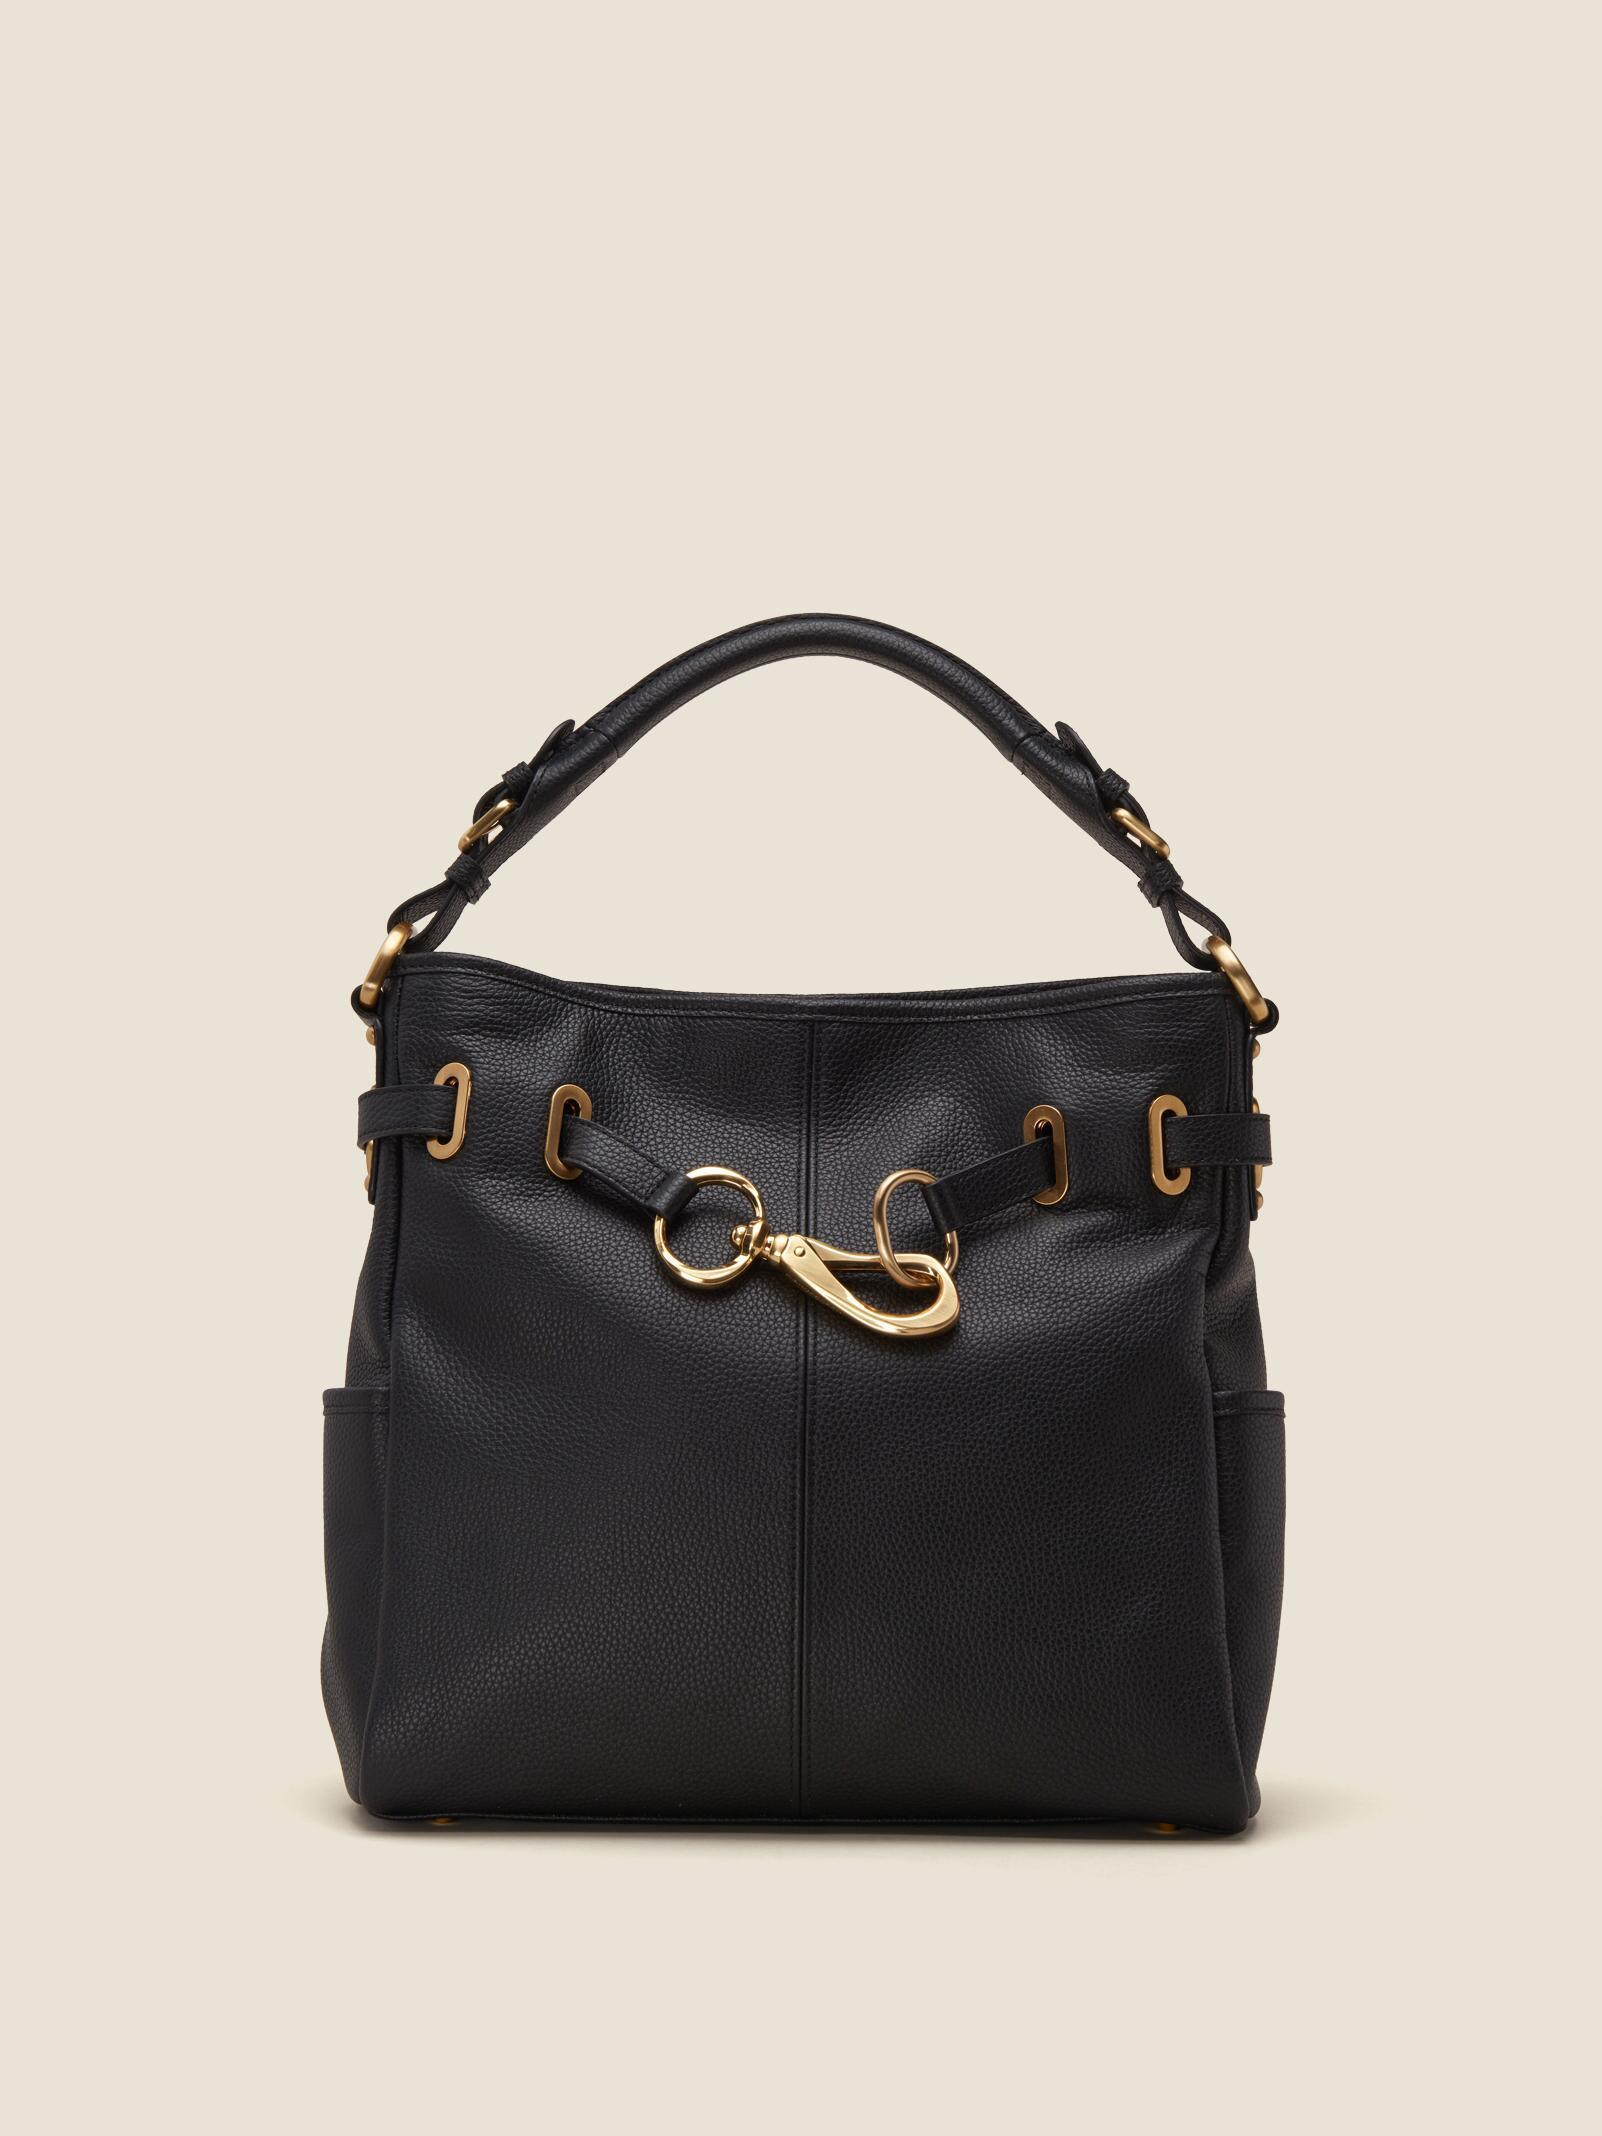 DKNY Sally Hobo (Black) Hobo Handbags O6FP5